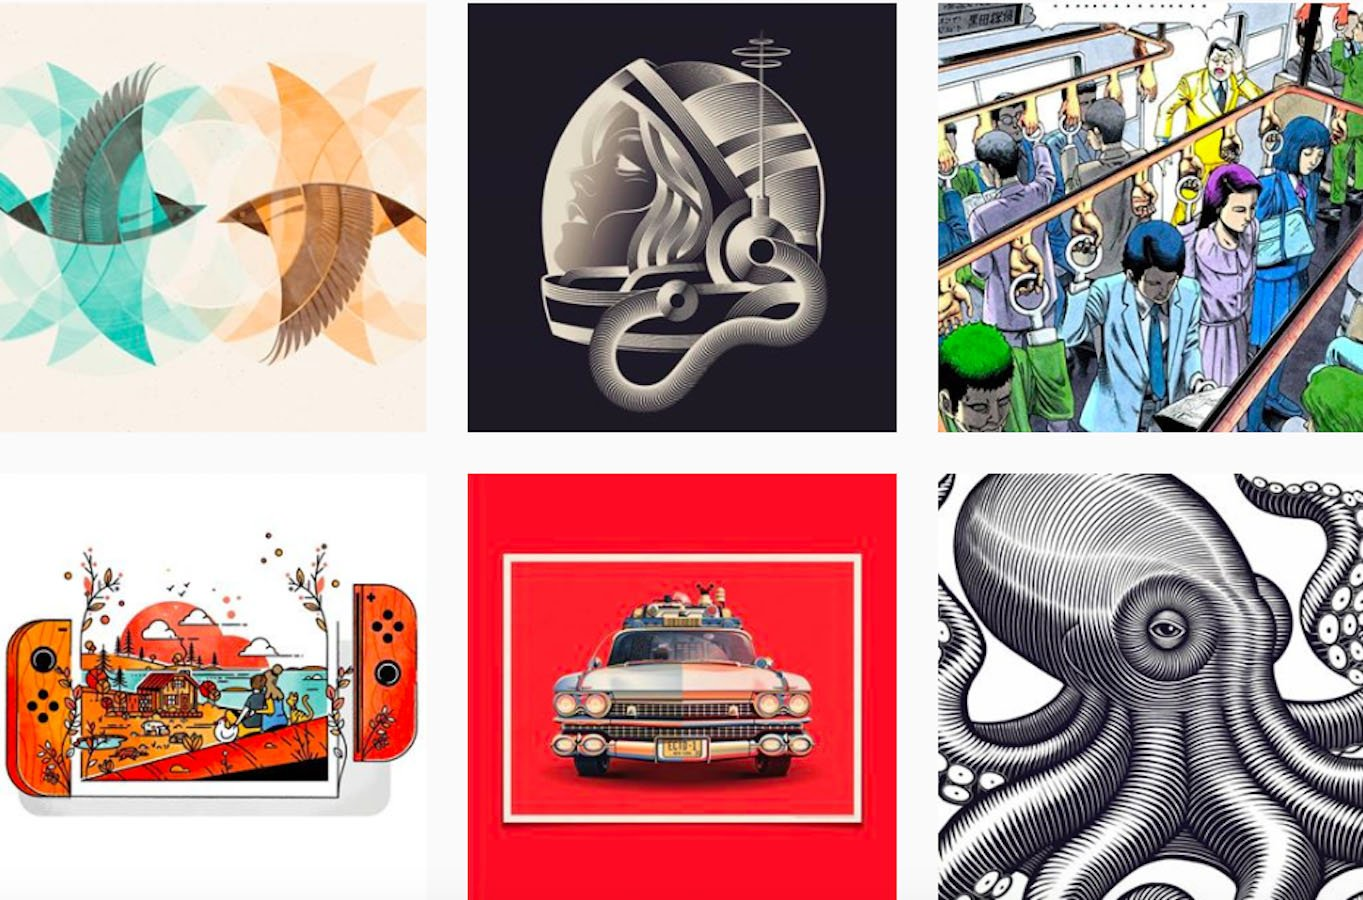 Web Design Inspiration: 110+ Accounts On Instagram and 10+ Best UX & Web Design Books in 2020 - supplyanddesign